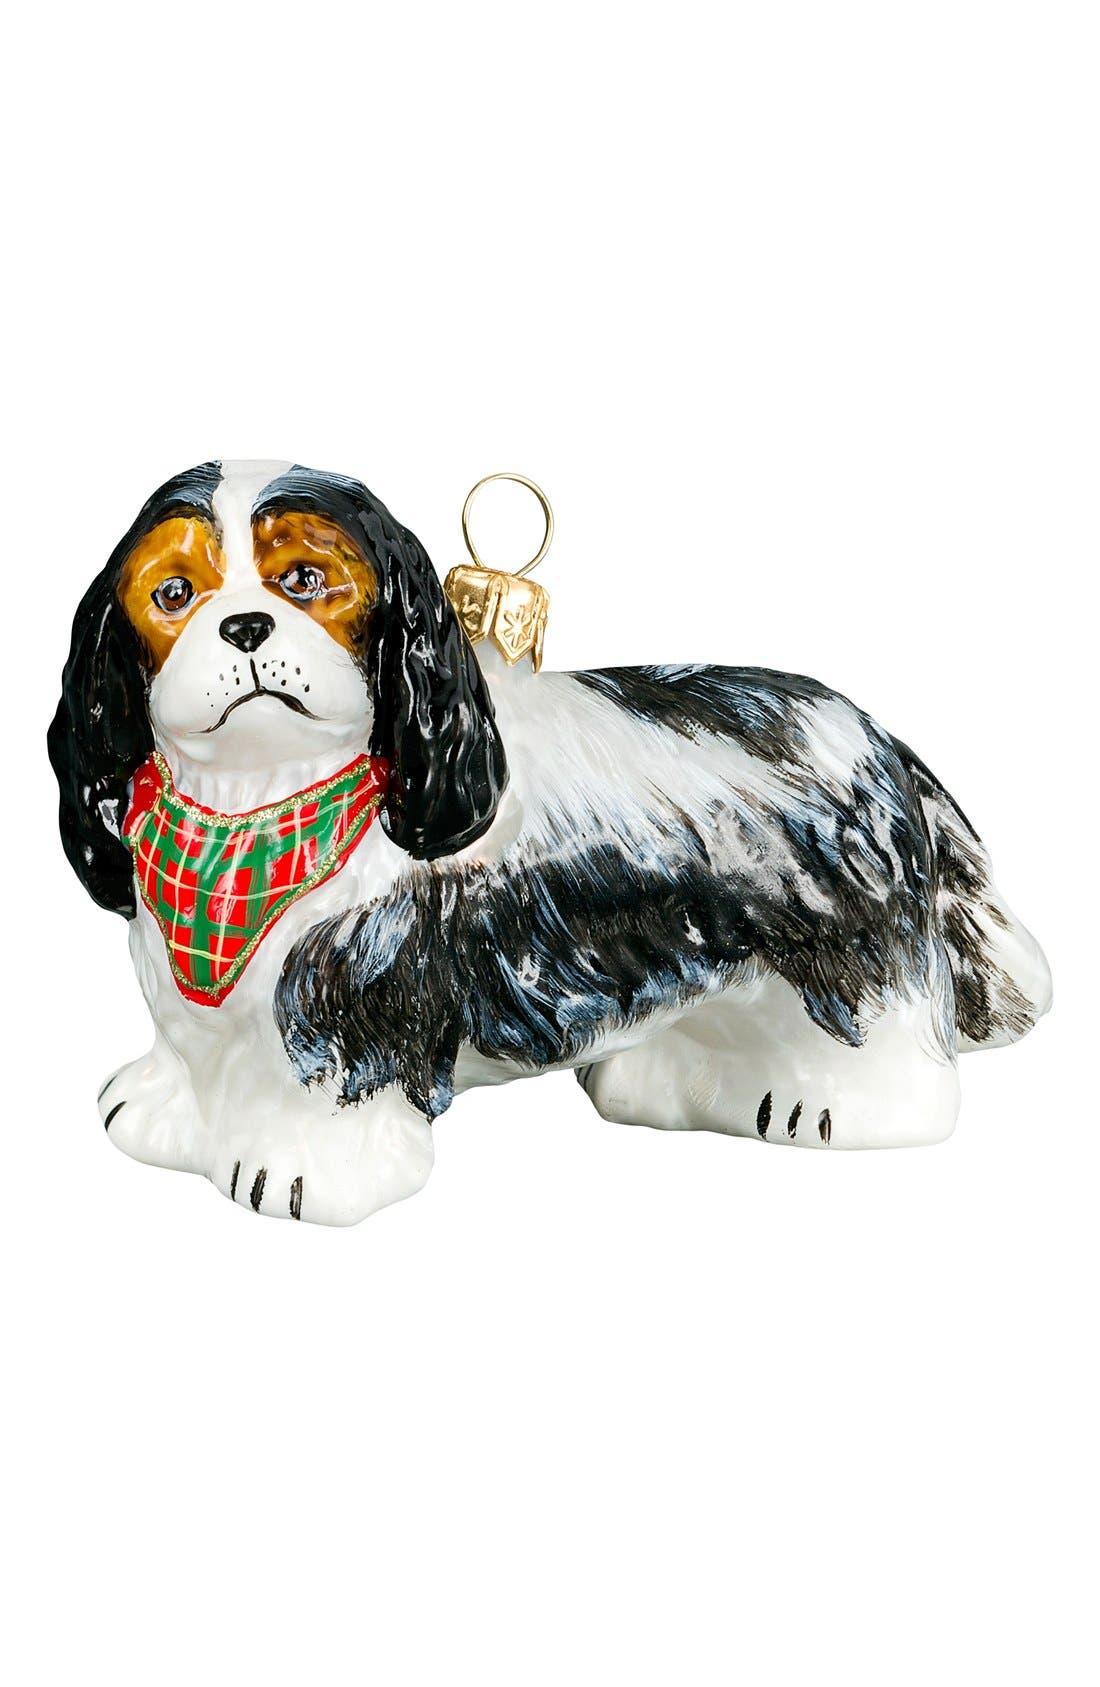 'Dog with Bandana' Ornament,                             Main thumbnail 1, color,                             CAVALIER KING CHARLES SPANIEL